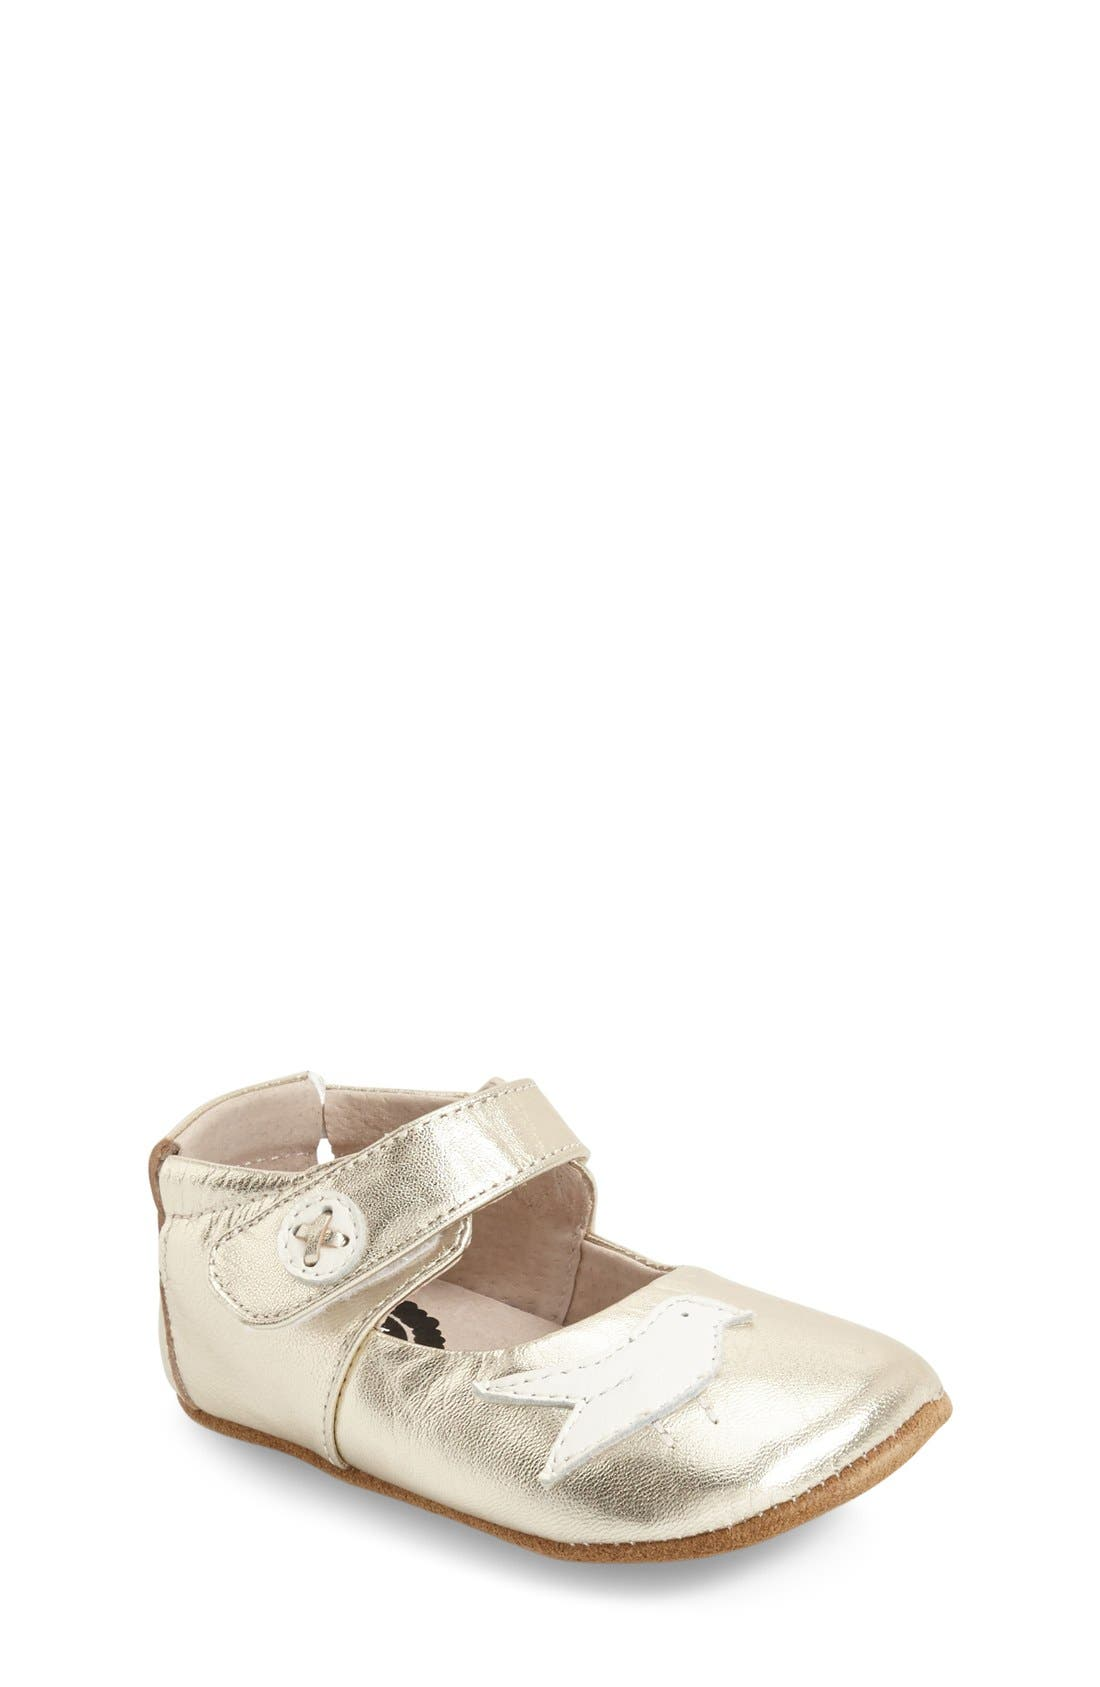 Livie & Luca Pio Pio Mary Jane Crib Shoe (Baby & Walker)